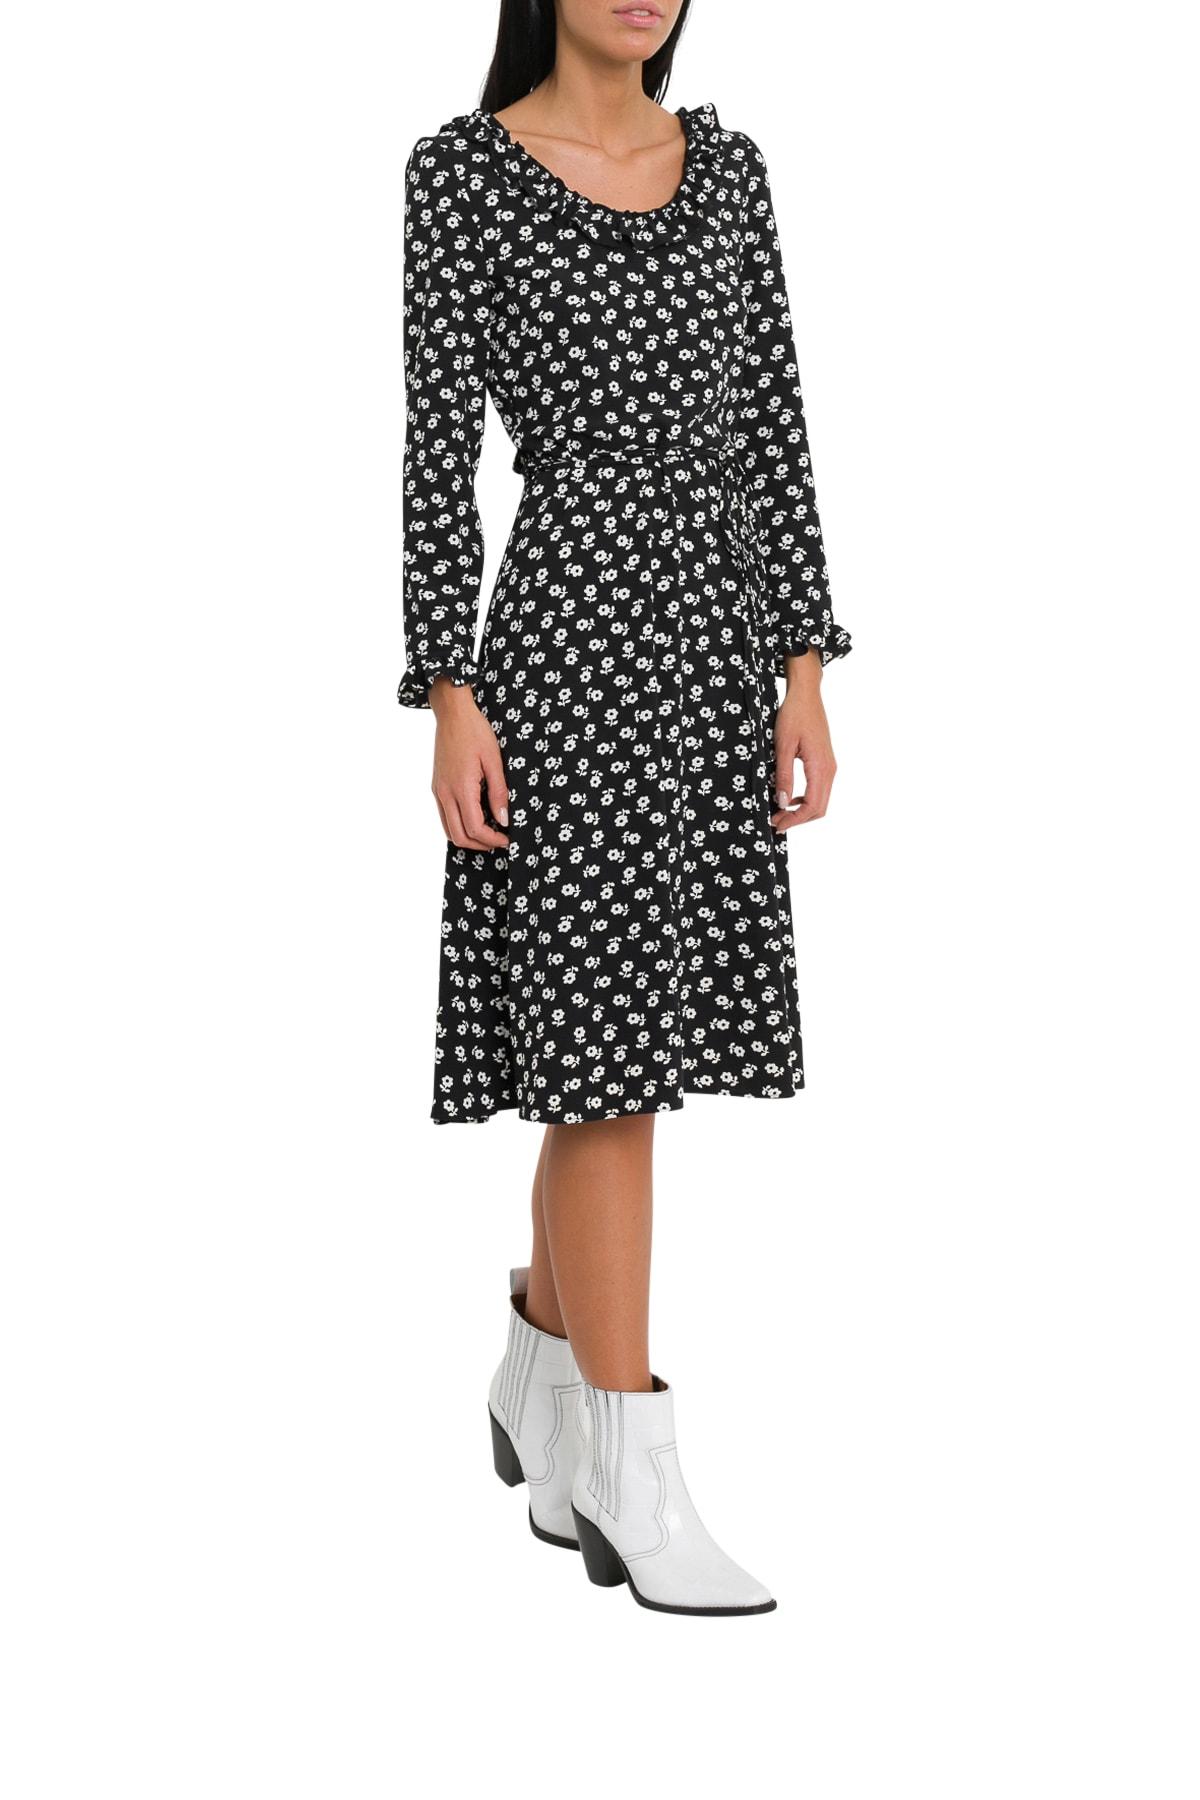 ALEXACHUNG Midi Wrap-dress